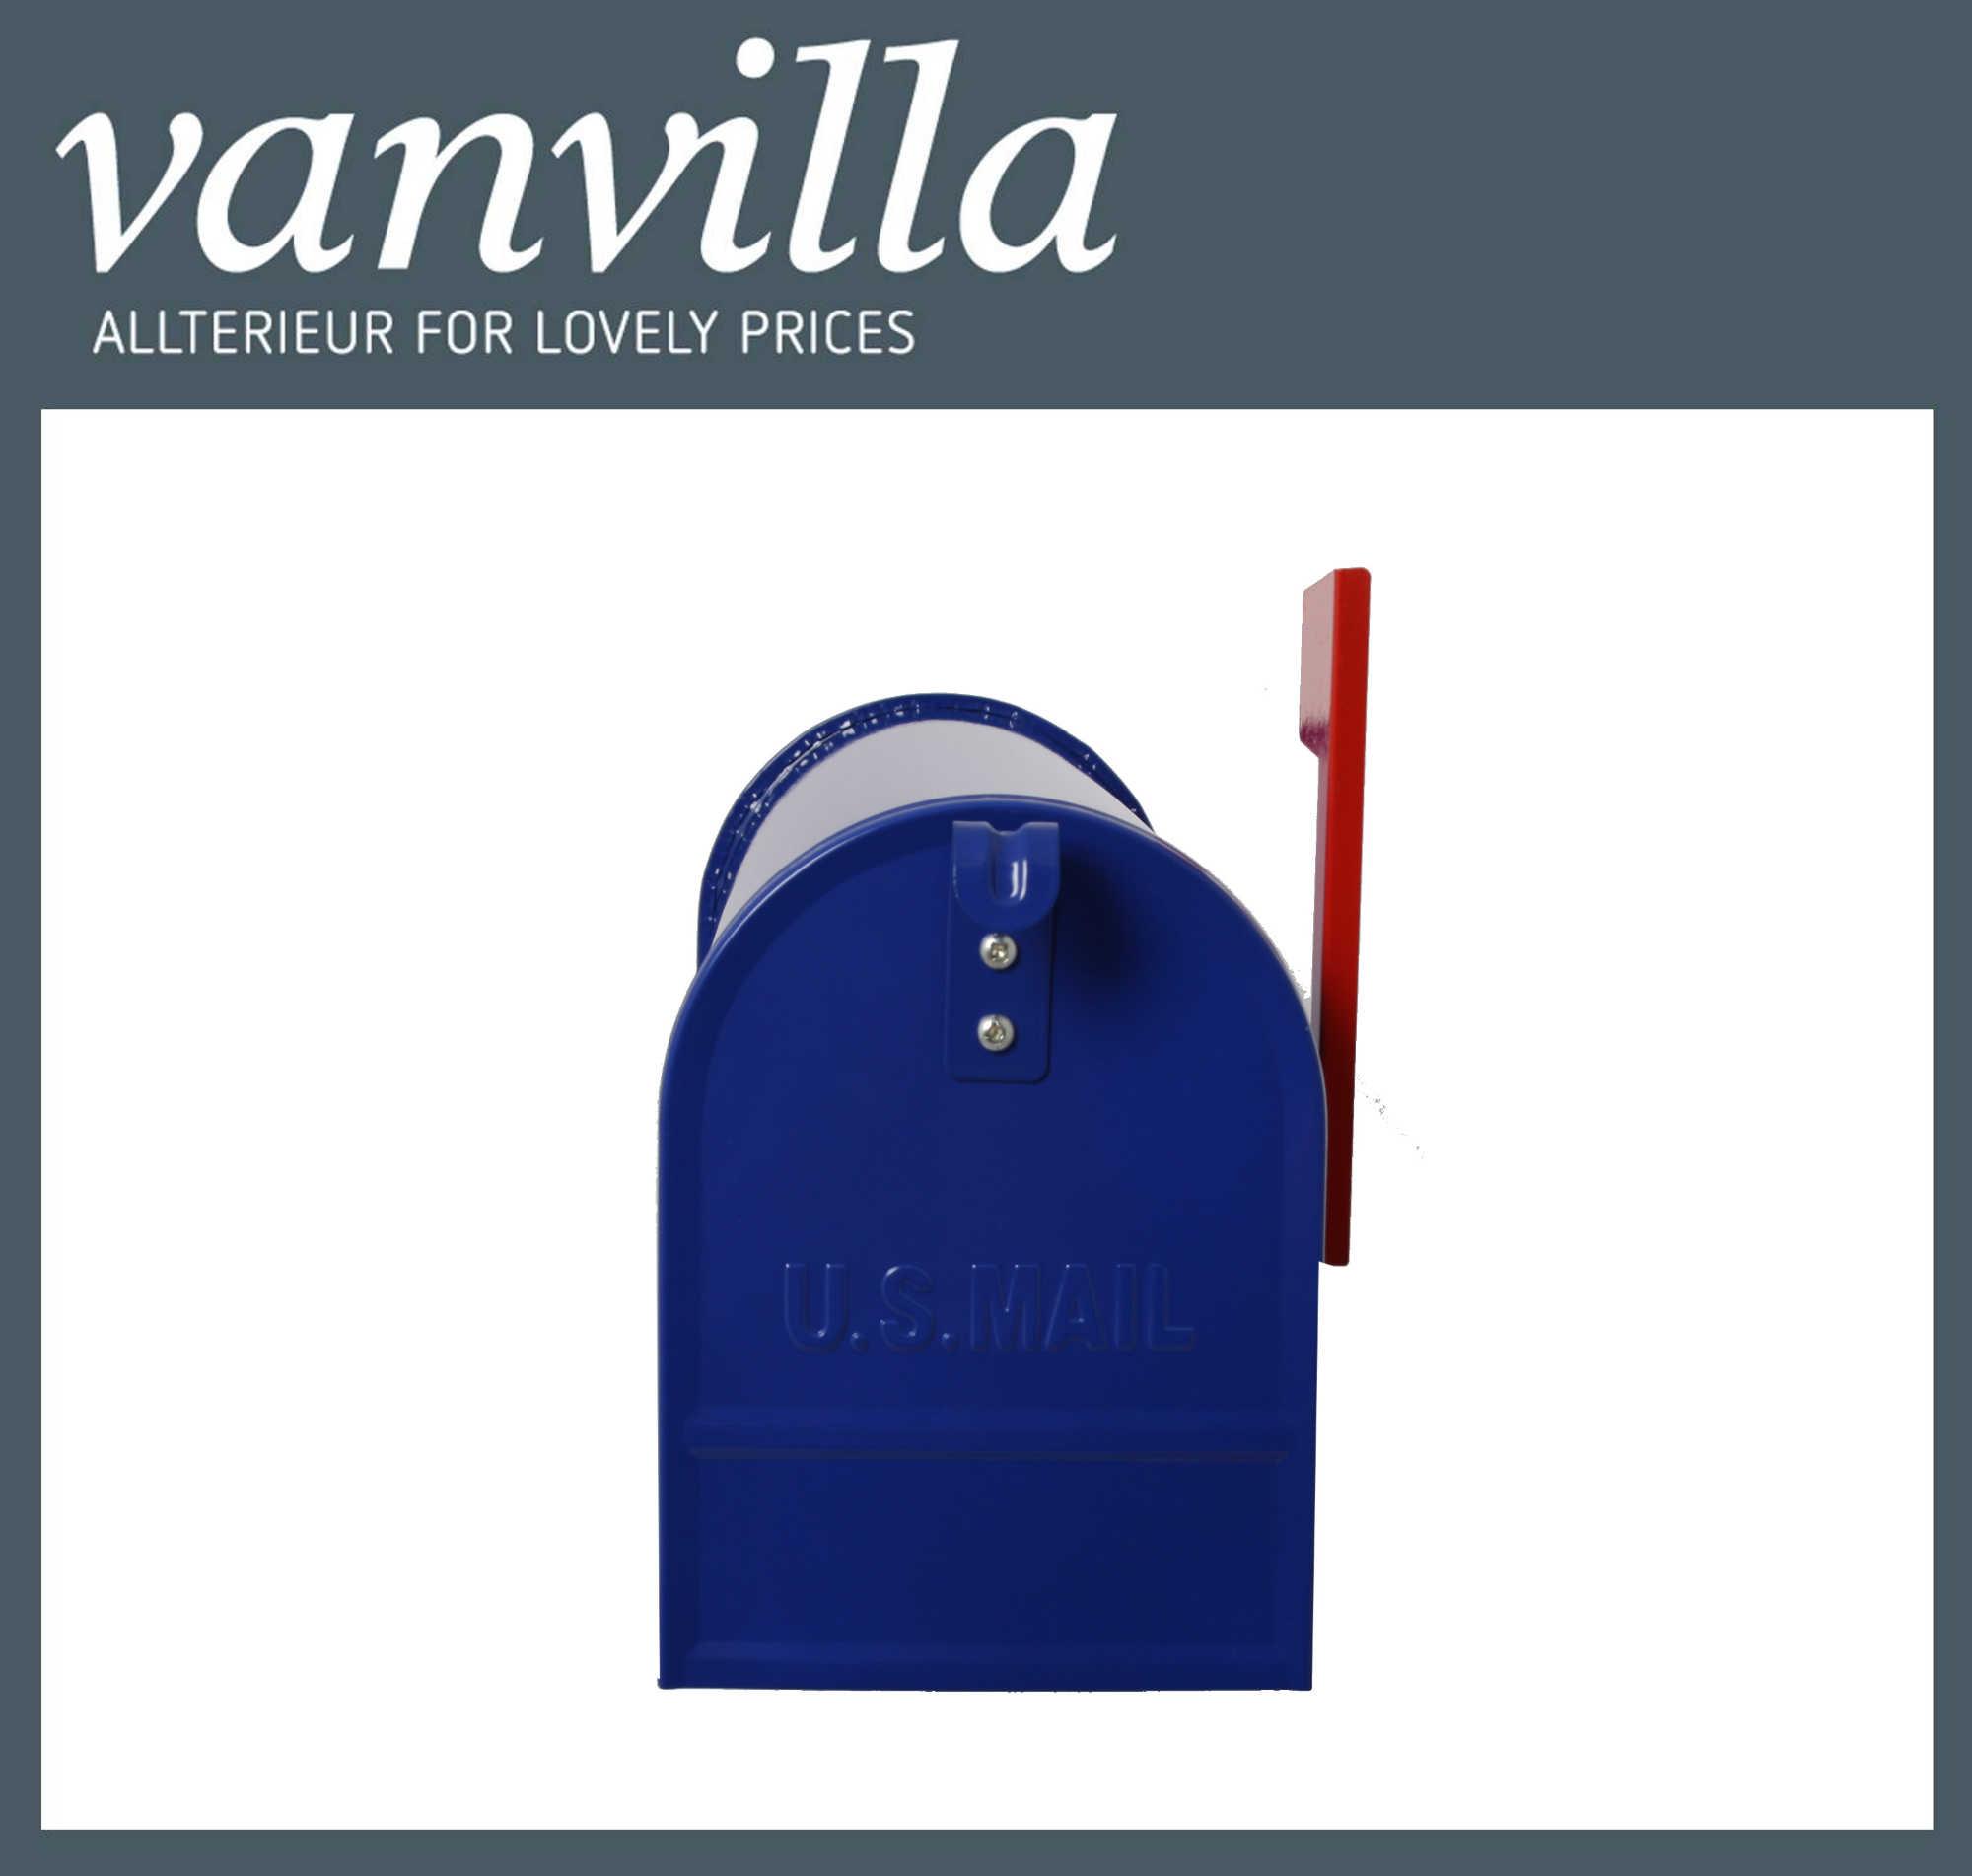 US-Mailbox Blau Wand